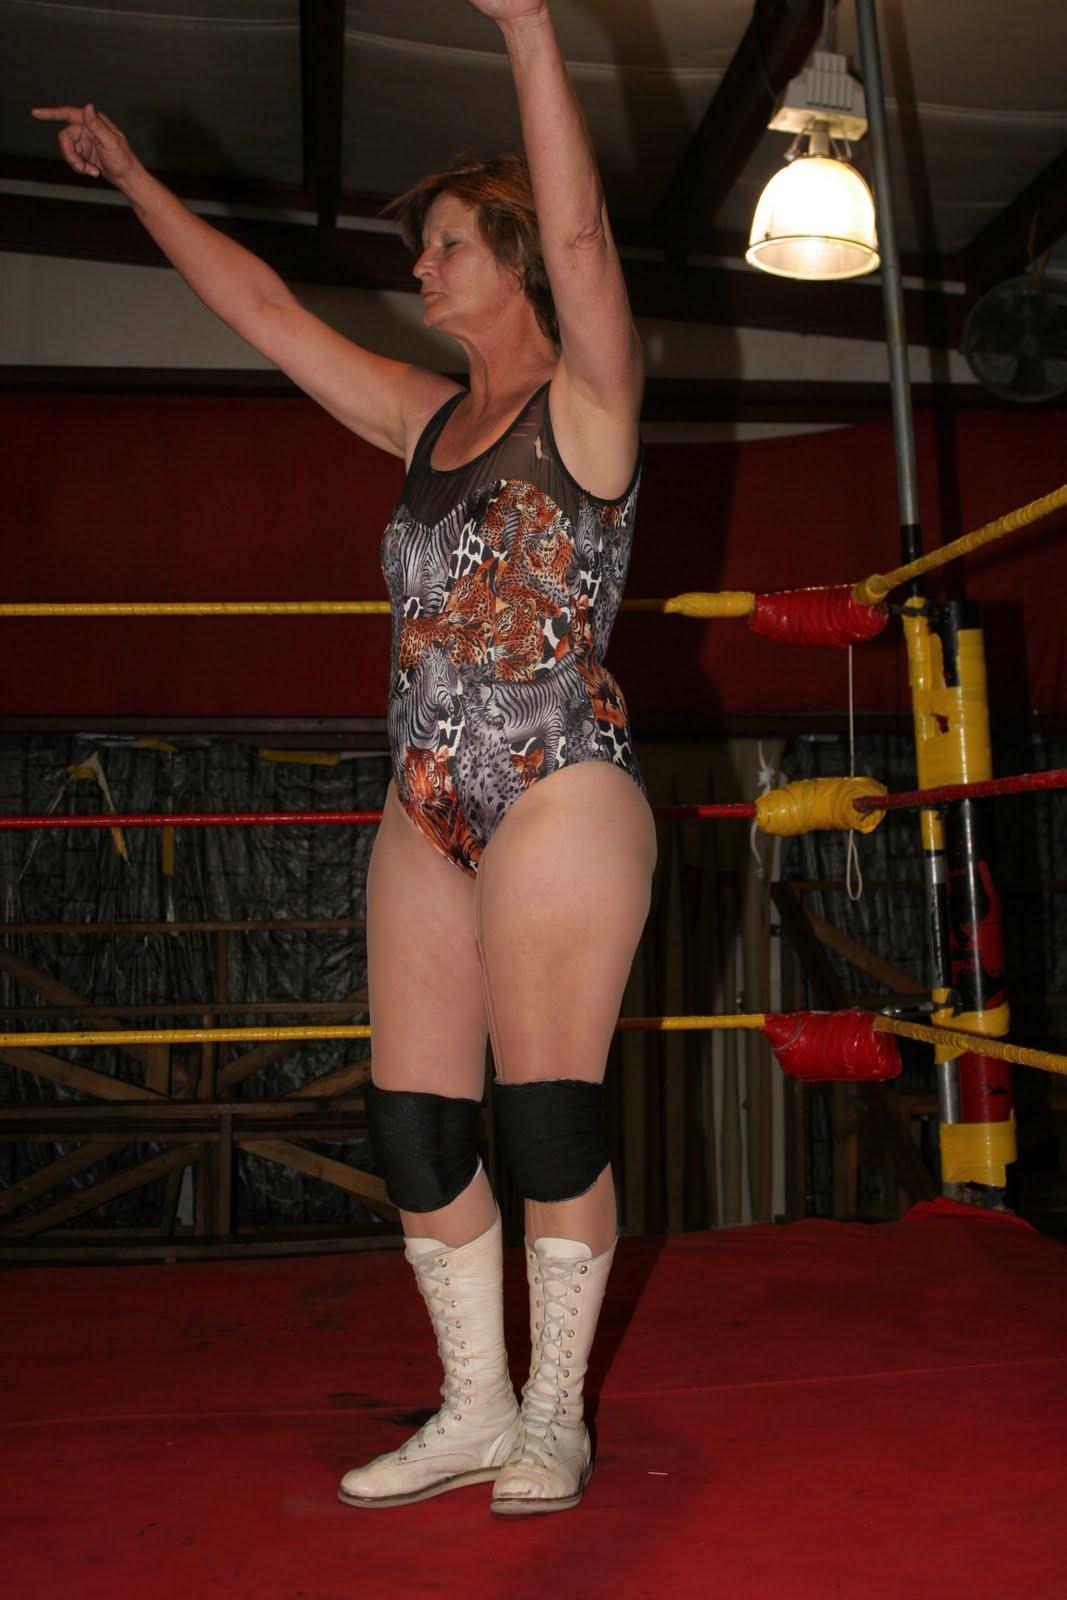 Magnificent Ladies Wrestling Referee Kellen James Raises The Hand ...